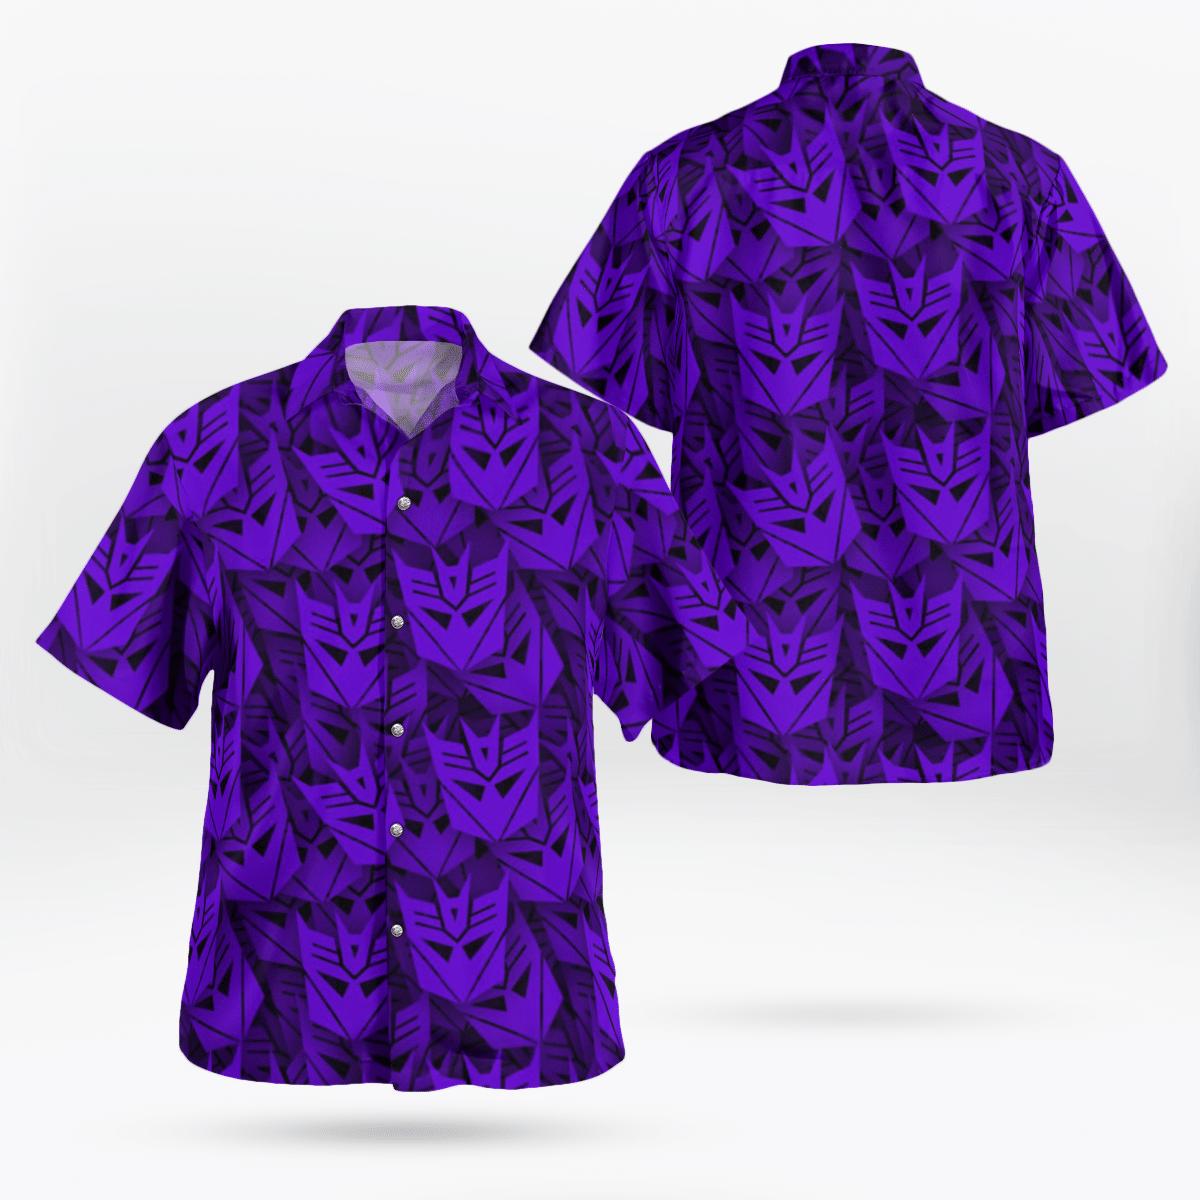 Decepticon Transformer Purple Hawaiian Shirt